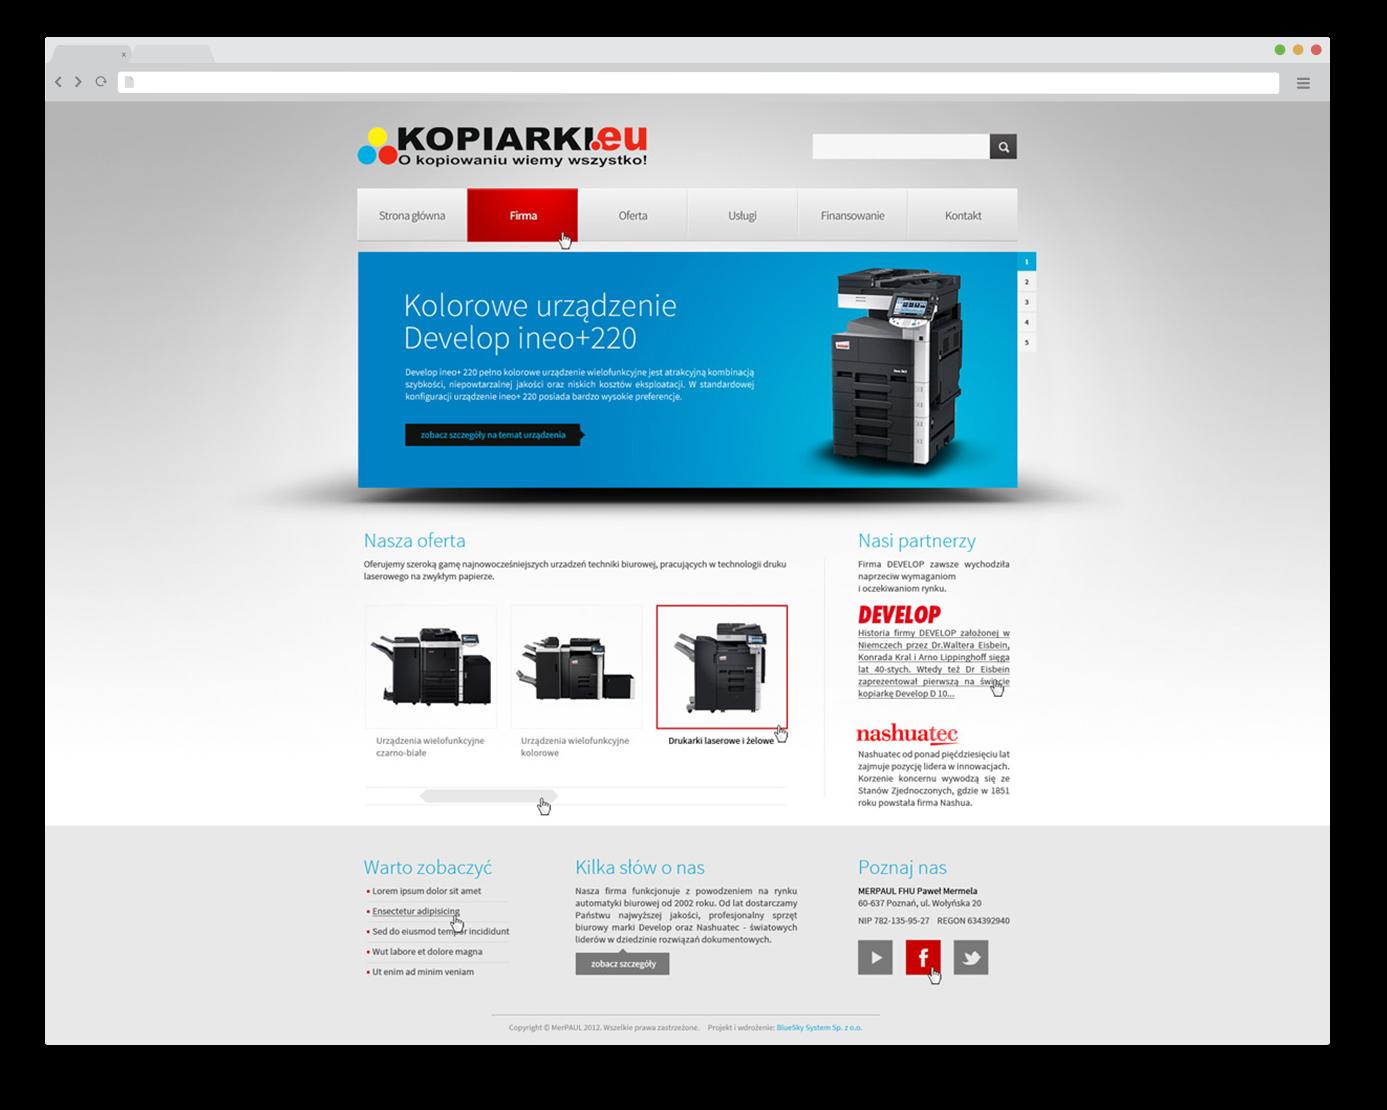 Portfolio BlueSky System: kopiarki.eu - FULL